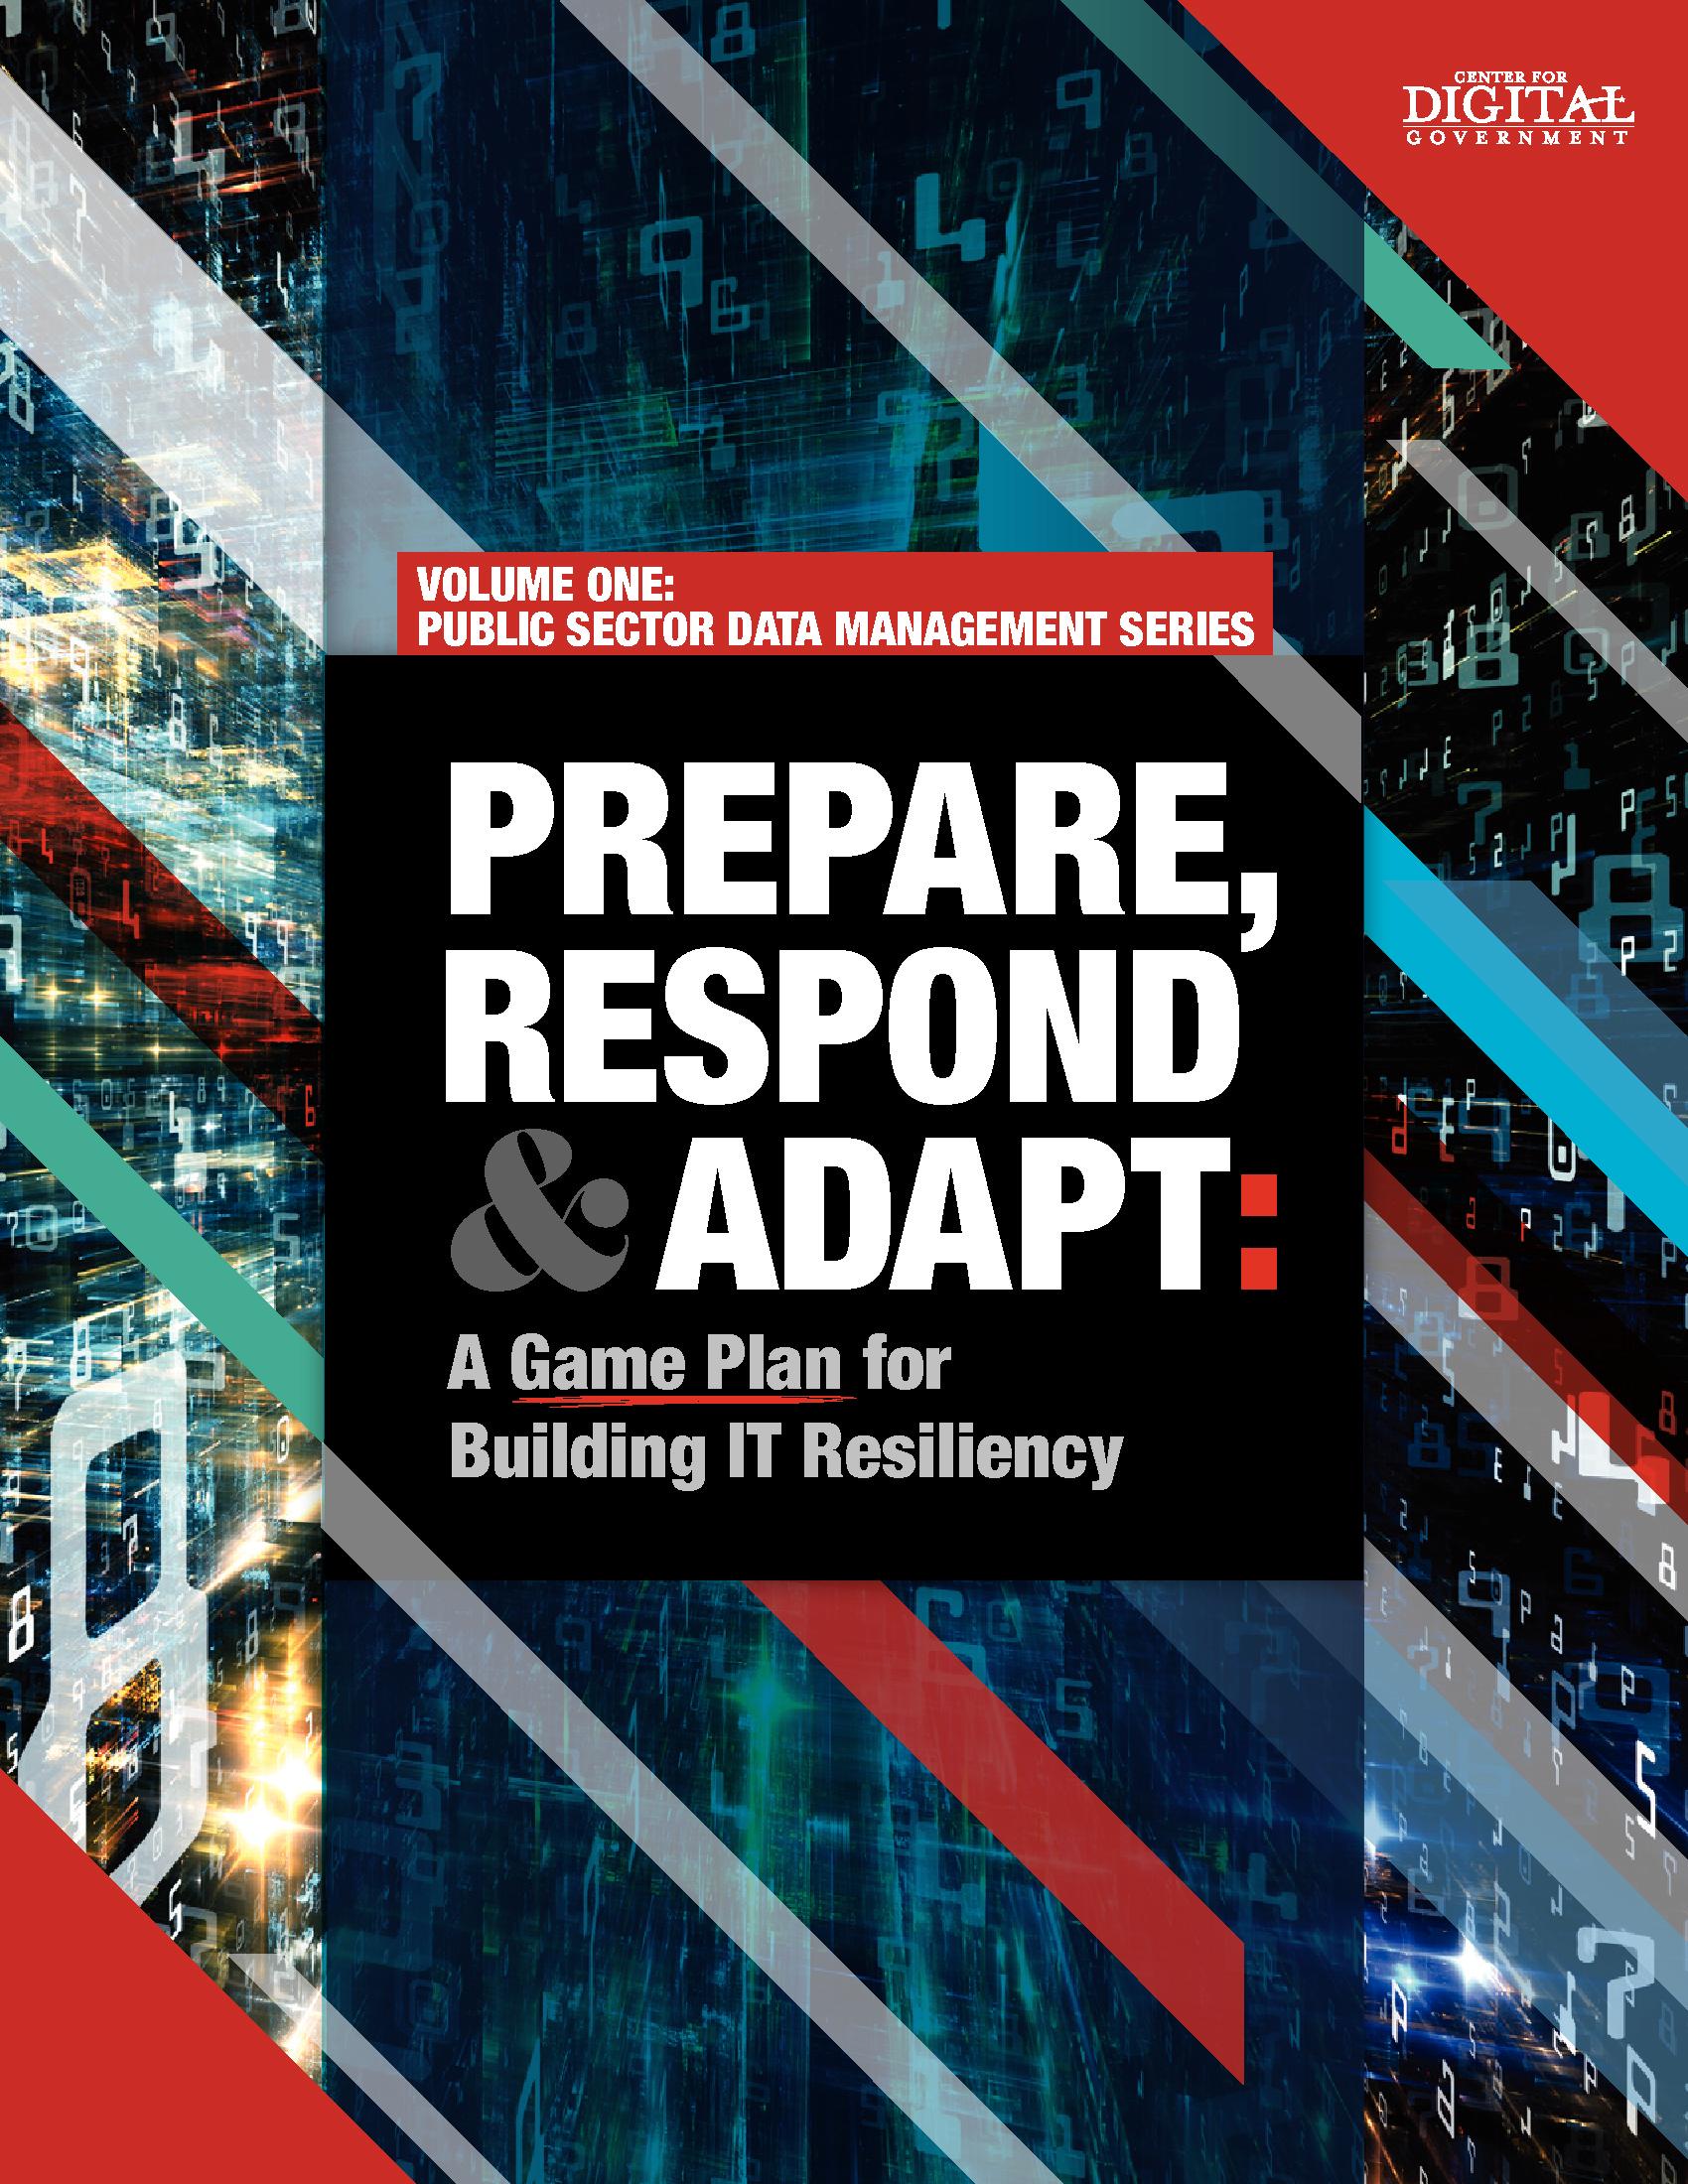 GT - Veritas - Handbook - 171002 - A Game Plan for Building IT Resiliency